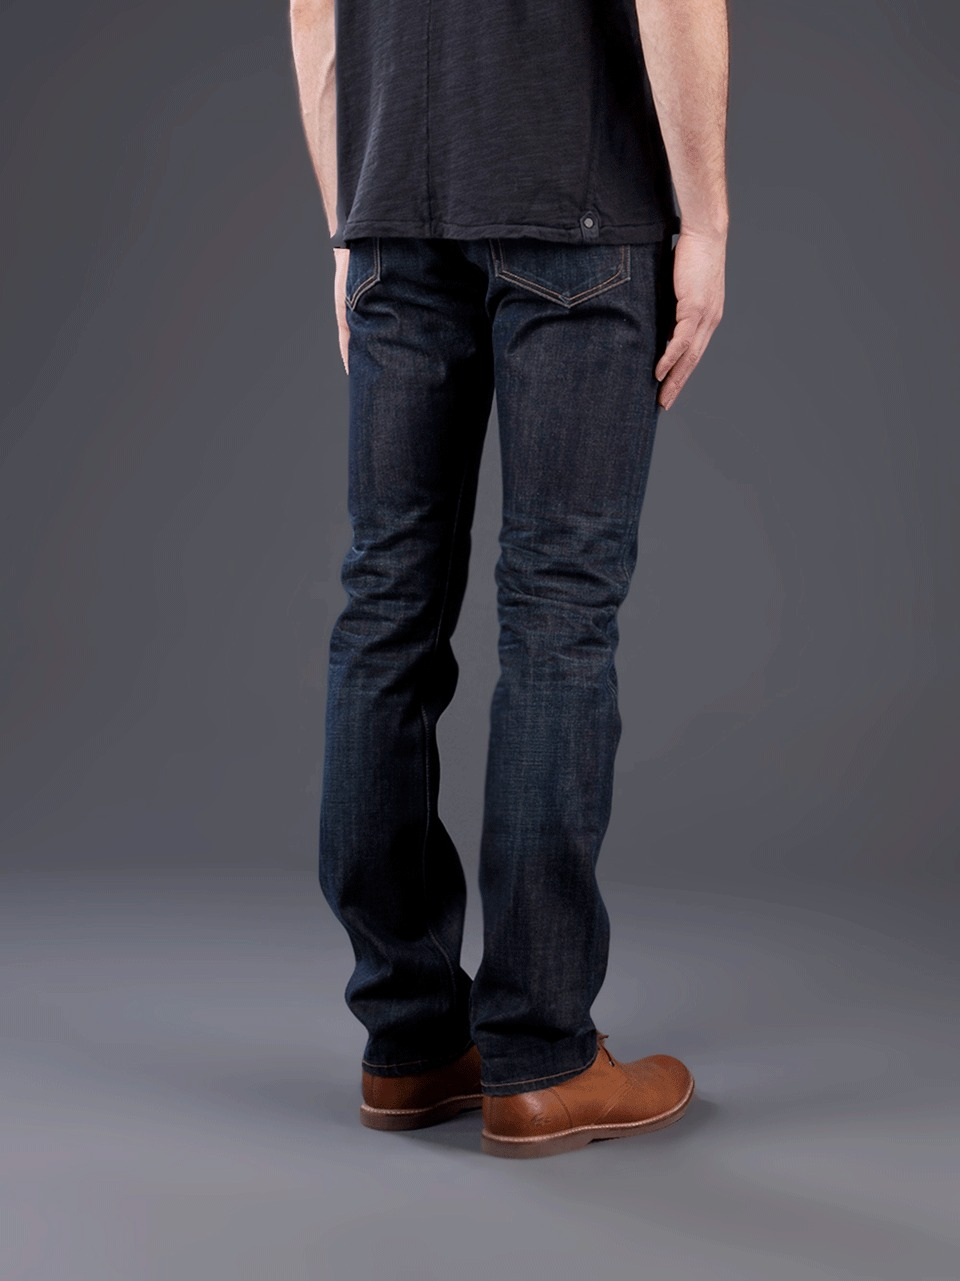 Jennifer Aniston in Low Rise rag & bone Jeans - Denimology